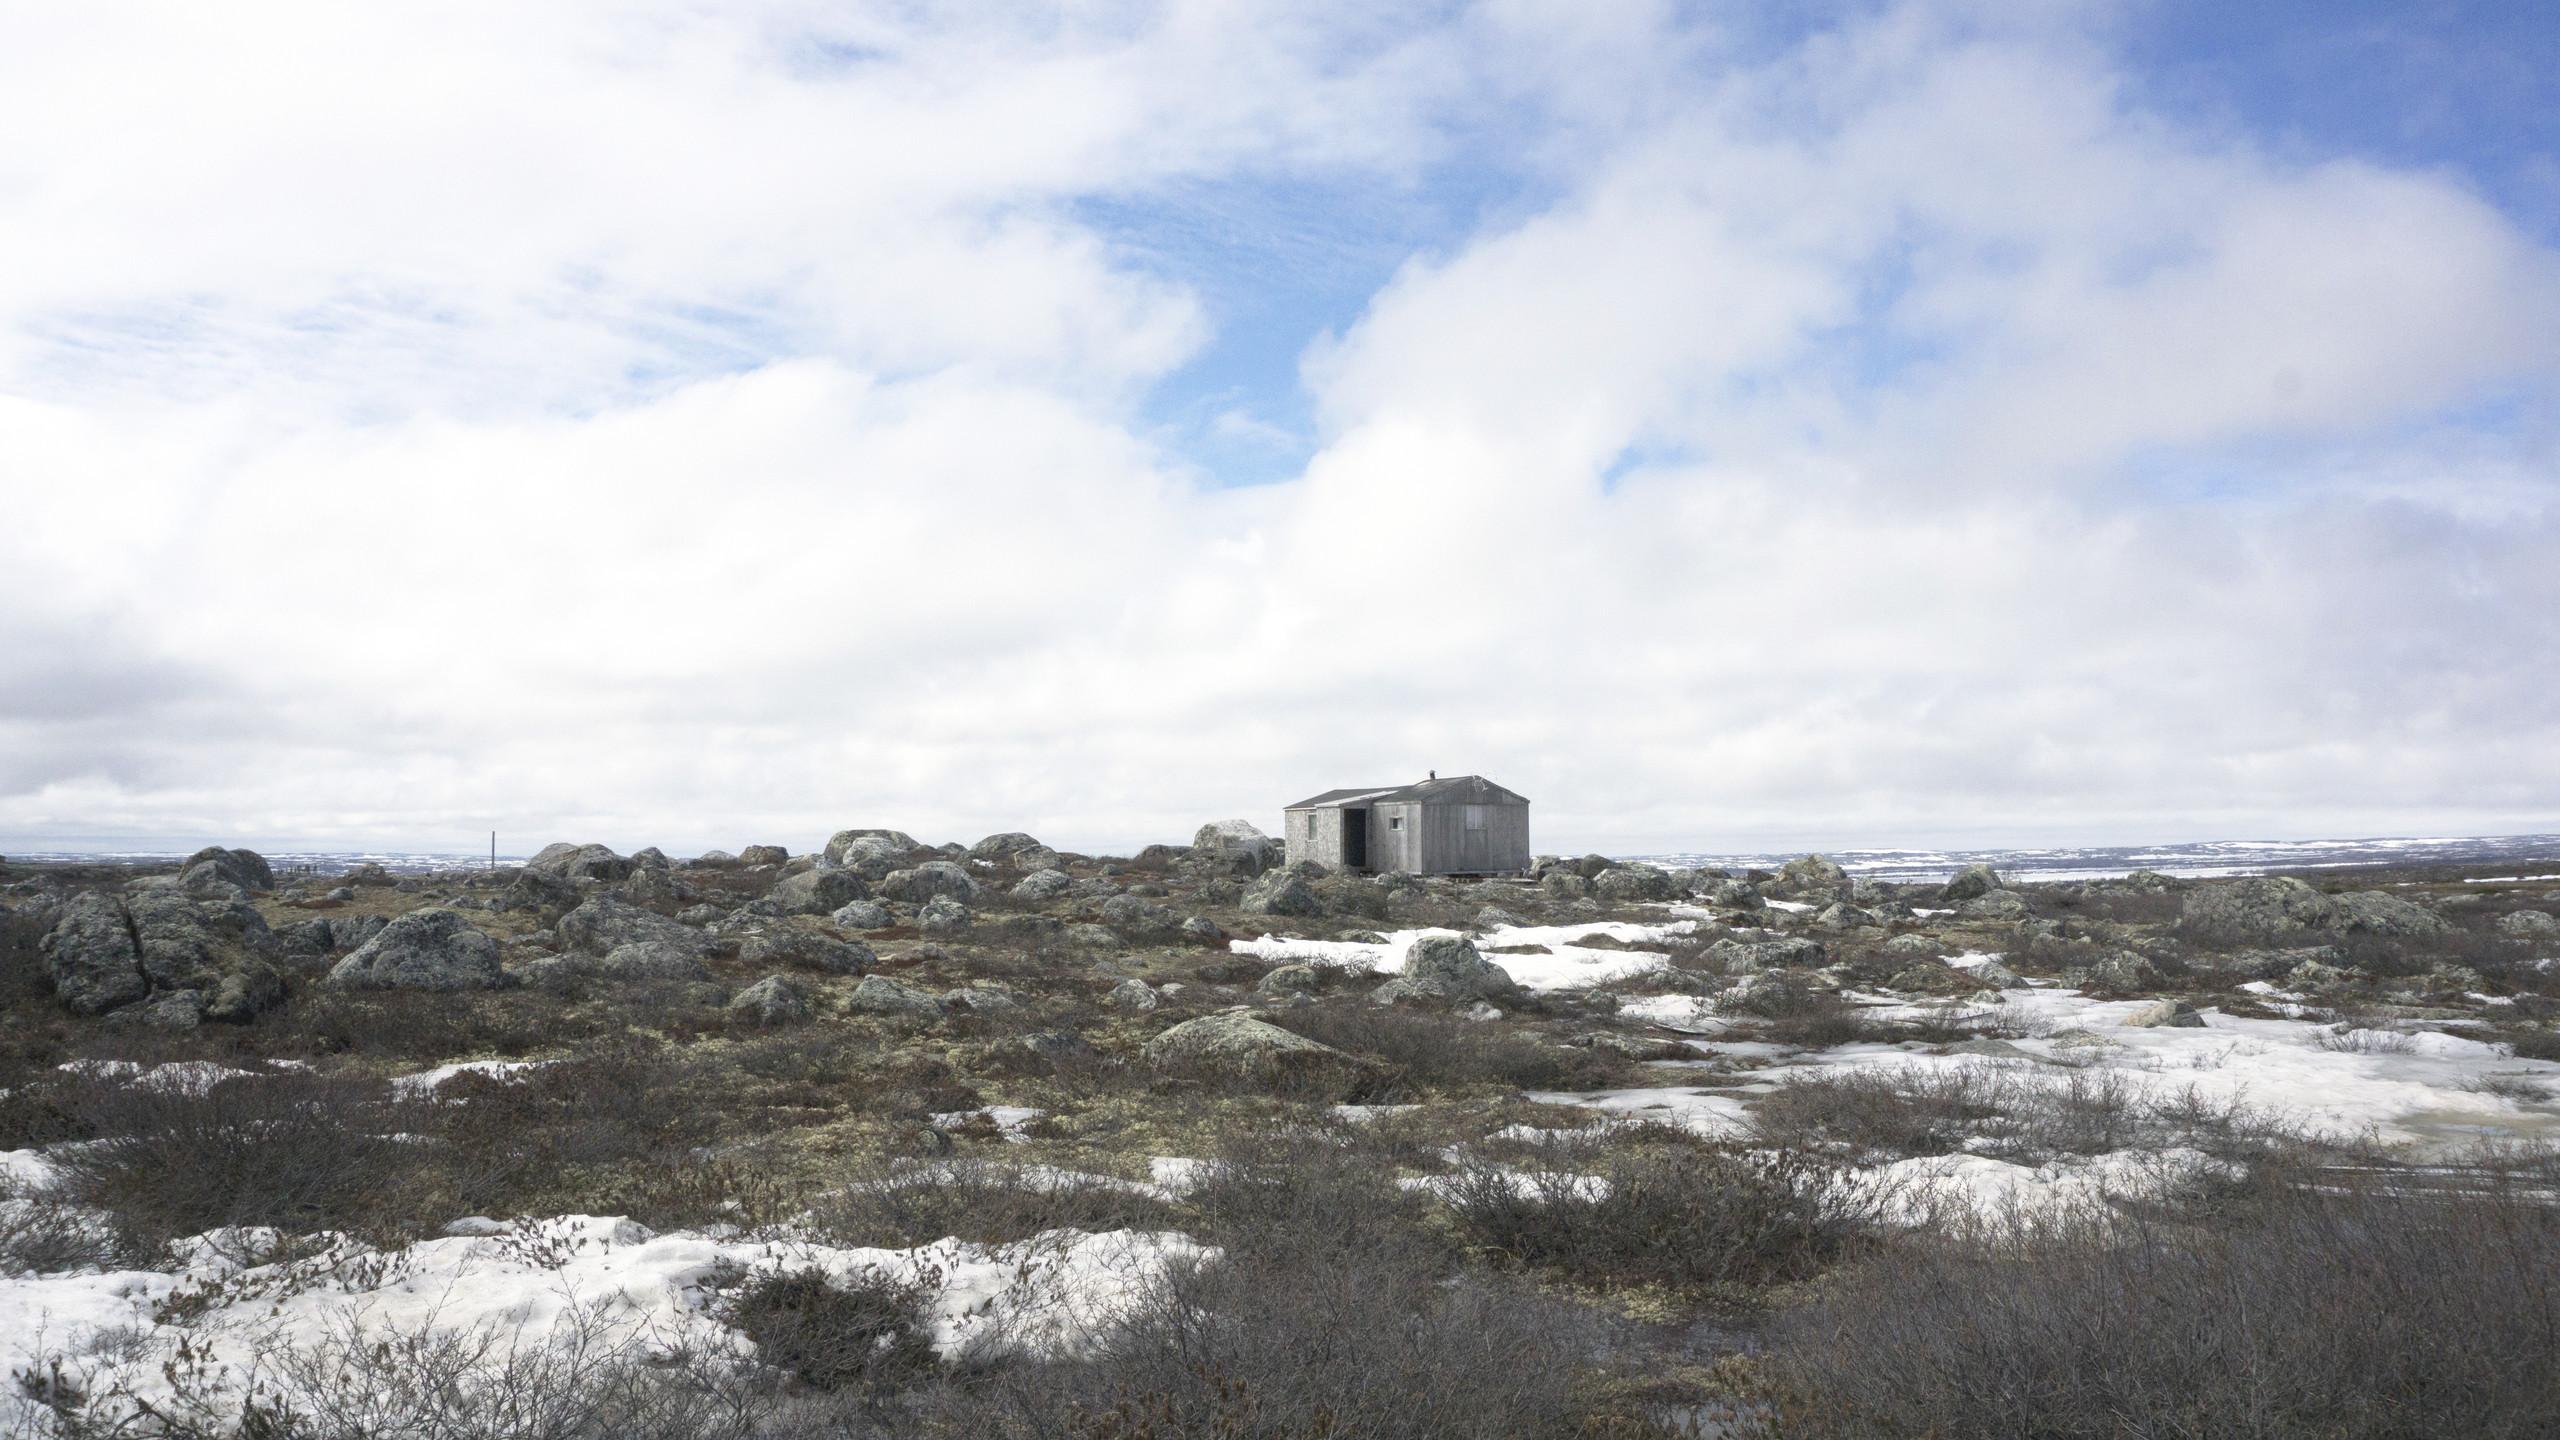 Cabin near Kuujjuaq